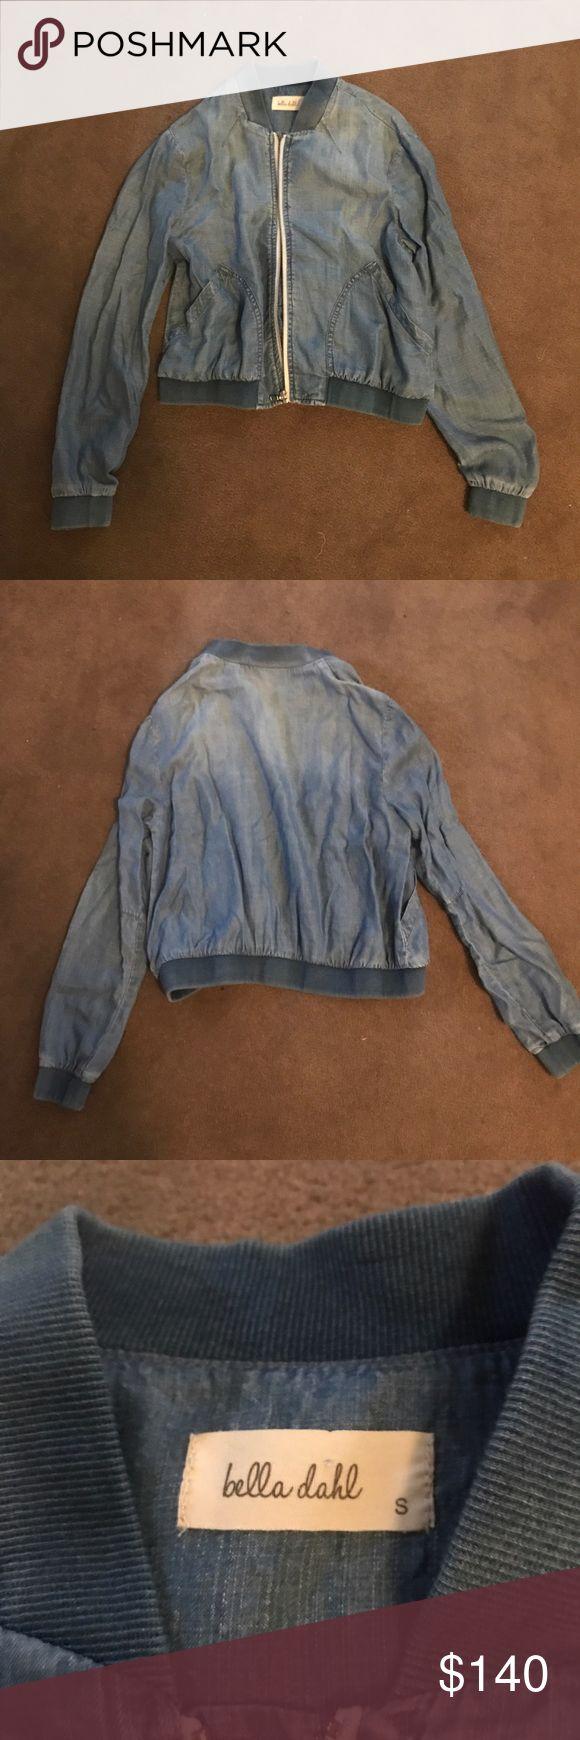 Della Dahl light denim zip up jacket Never worn. Very comfy. Very light. Great for spring and summer! Bella Dahl Jackets & Coats